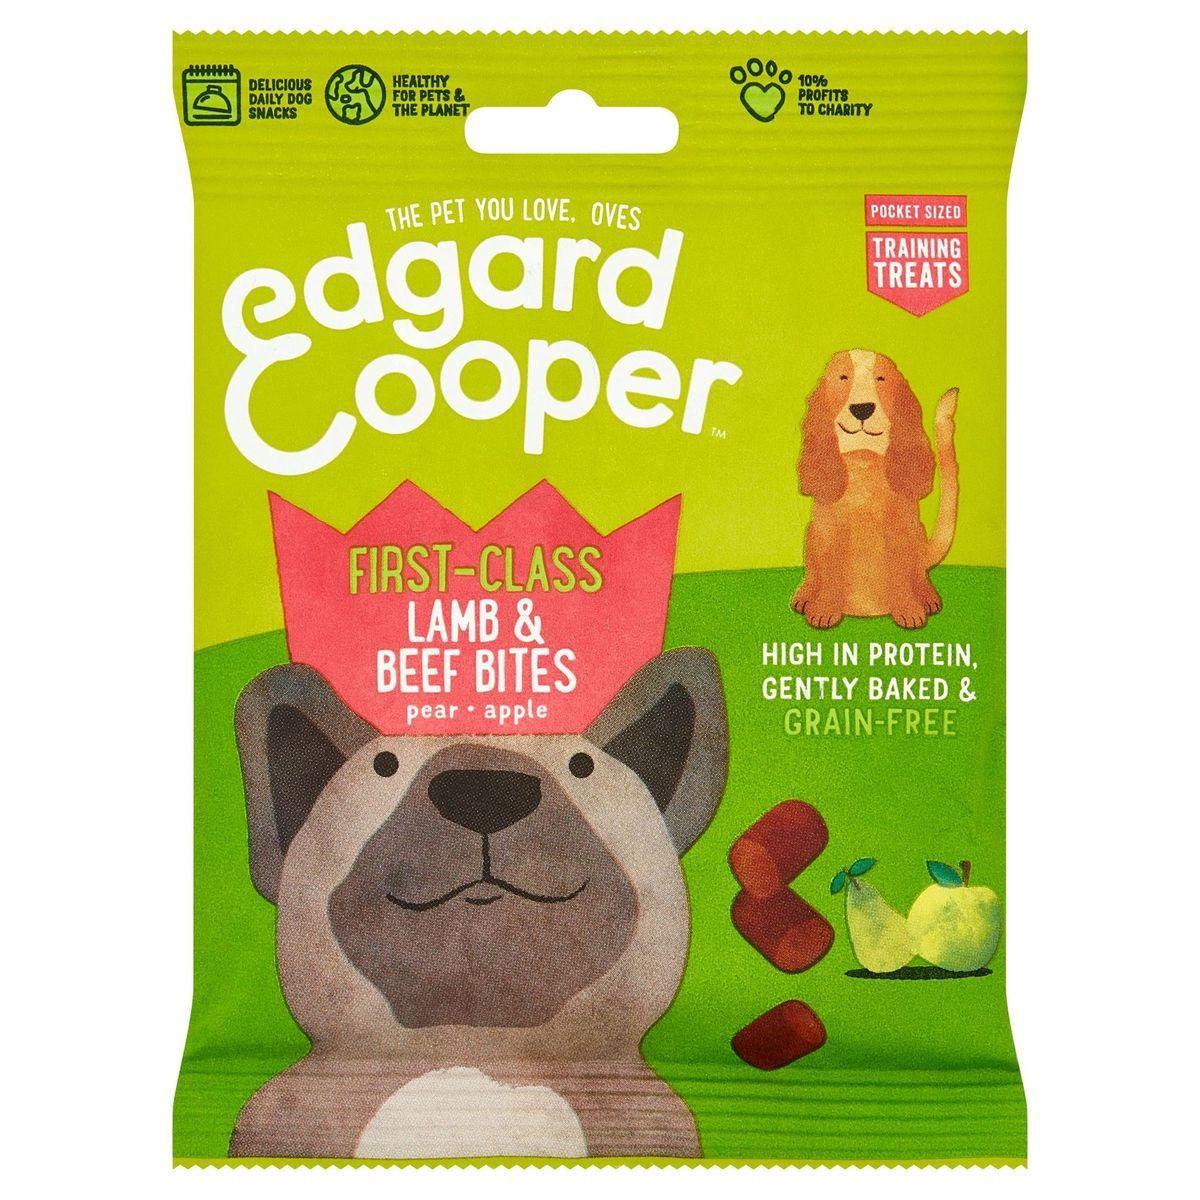 Edgard & Cooper First-Class Lamb & Beef Bites Pear Apple 50 g